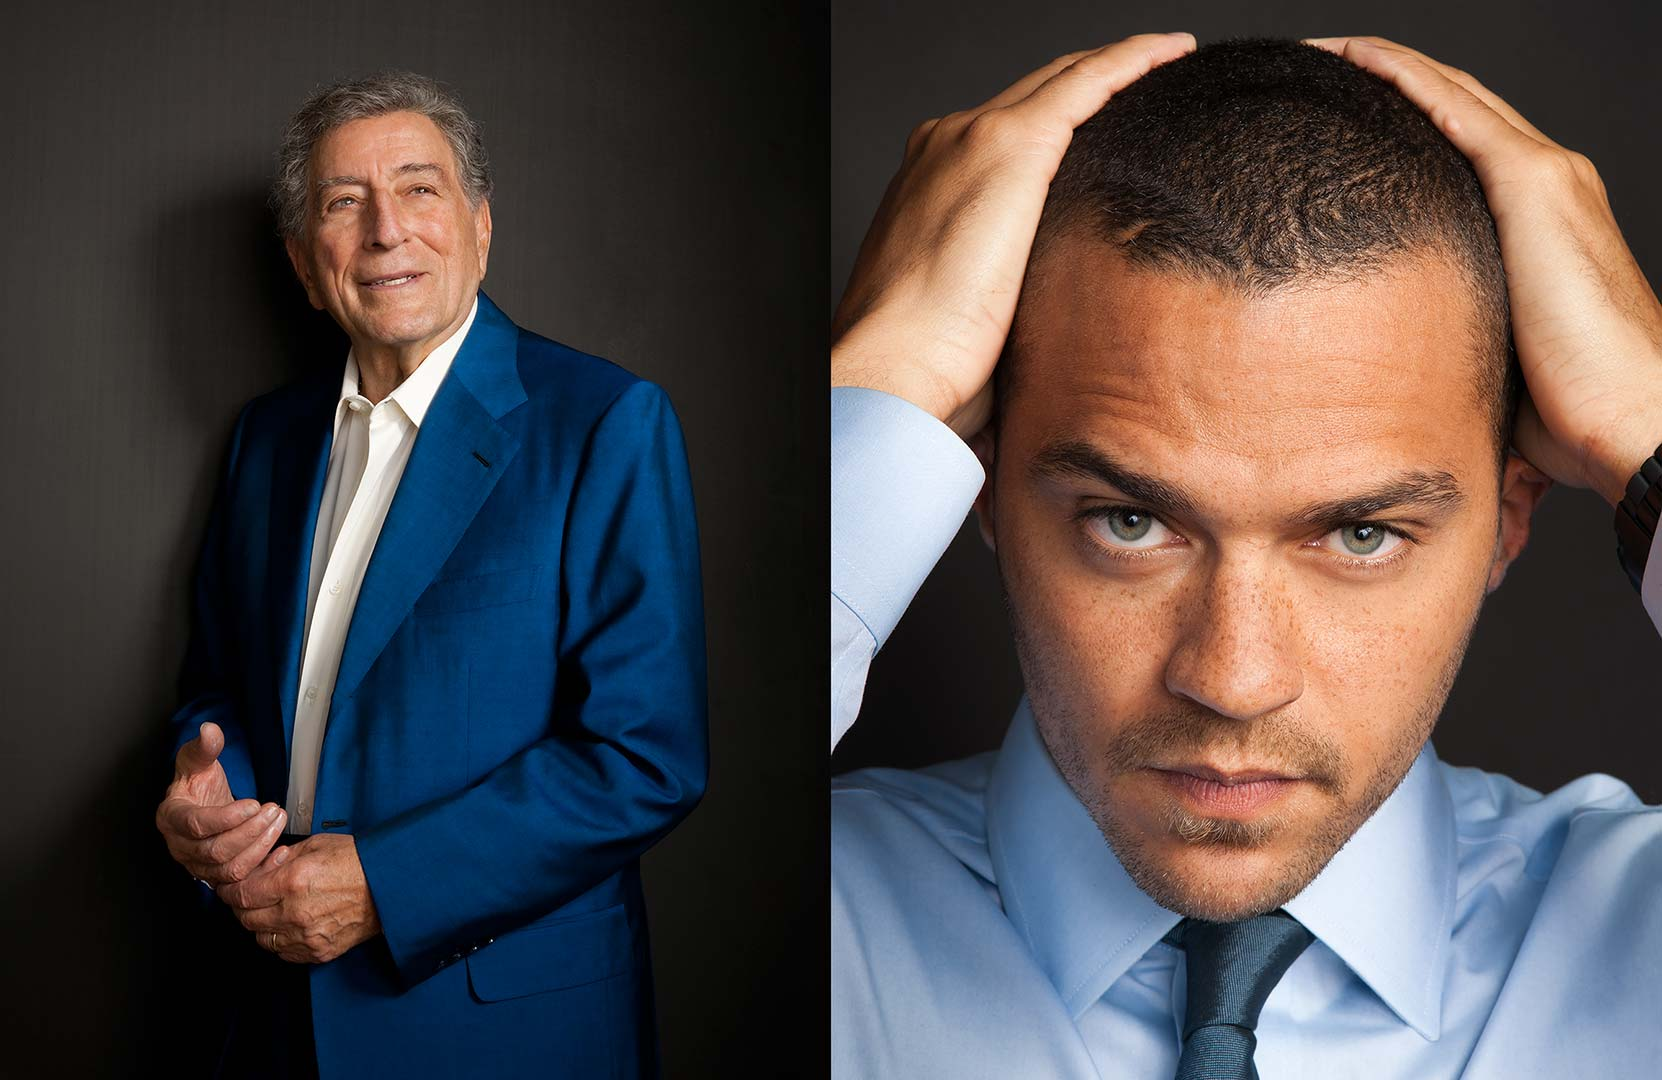 Celebrity portrait photography of Tony Bennett and Jesse Williams